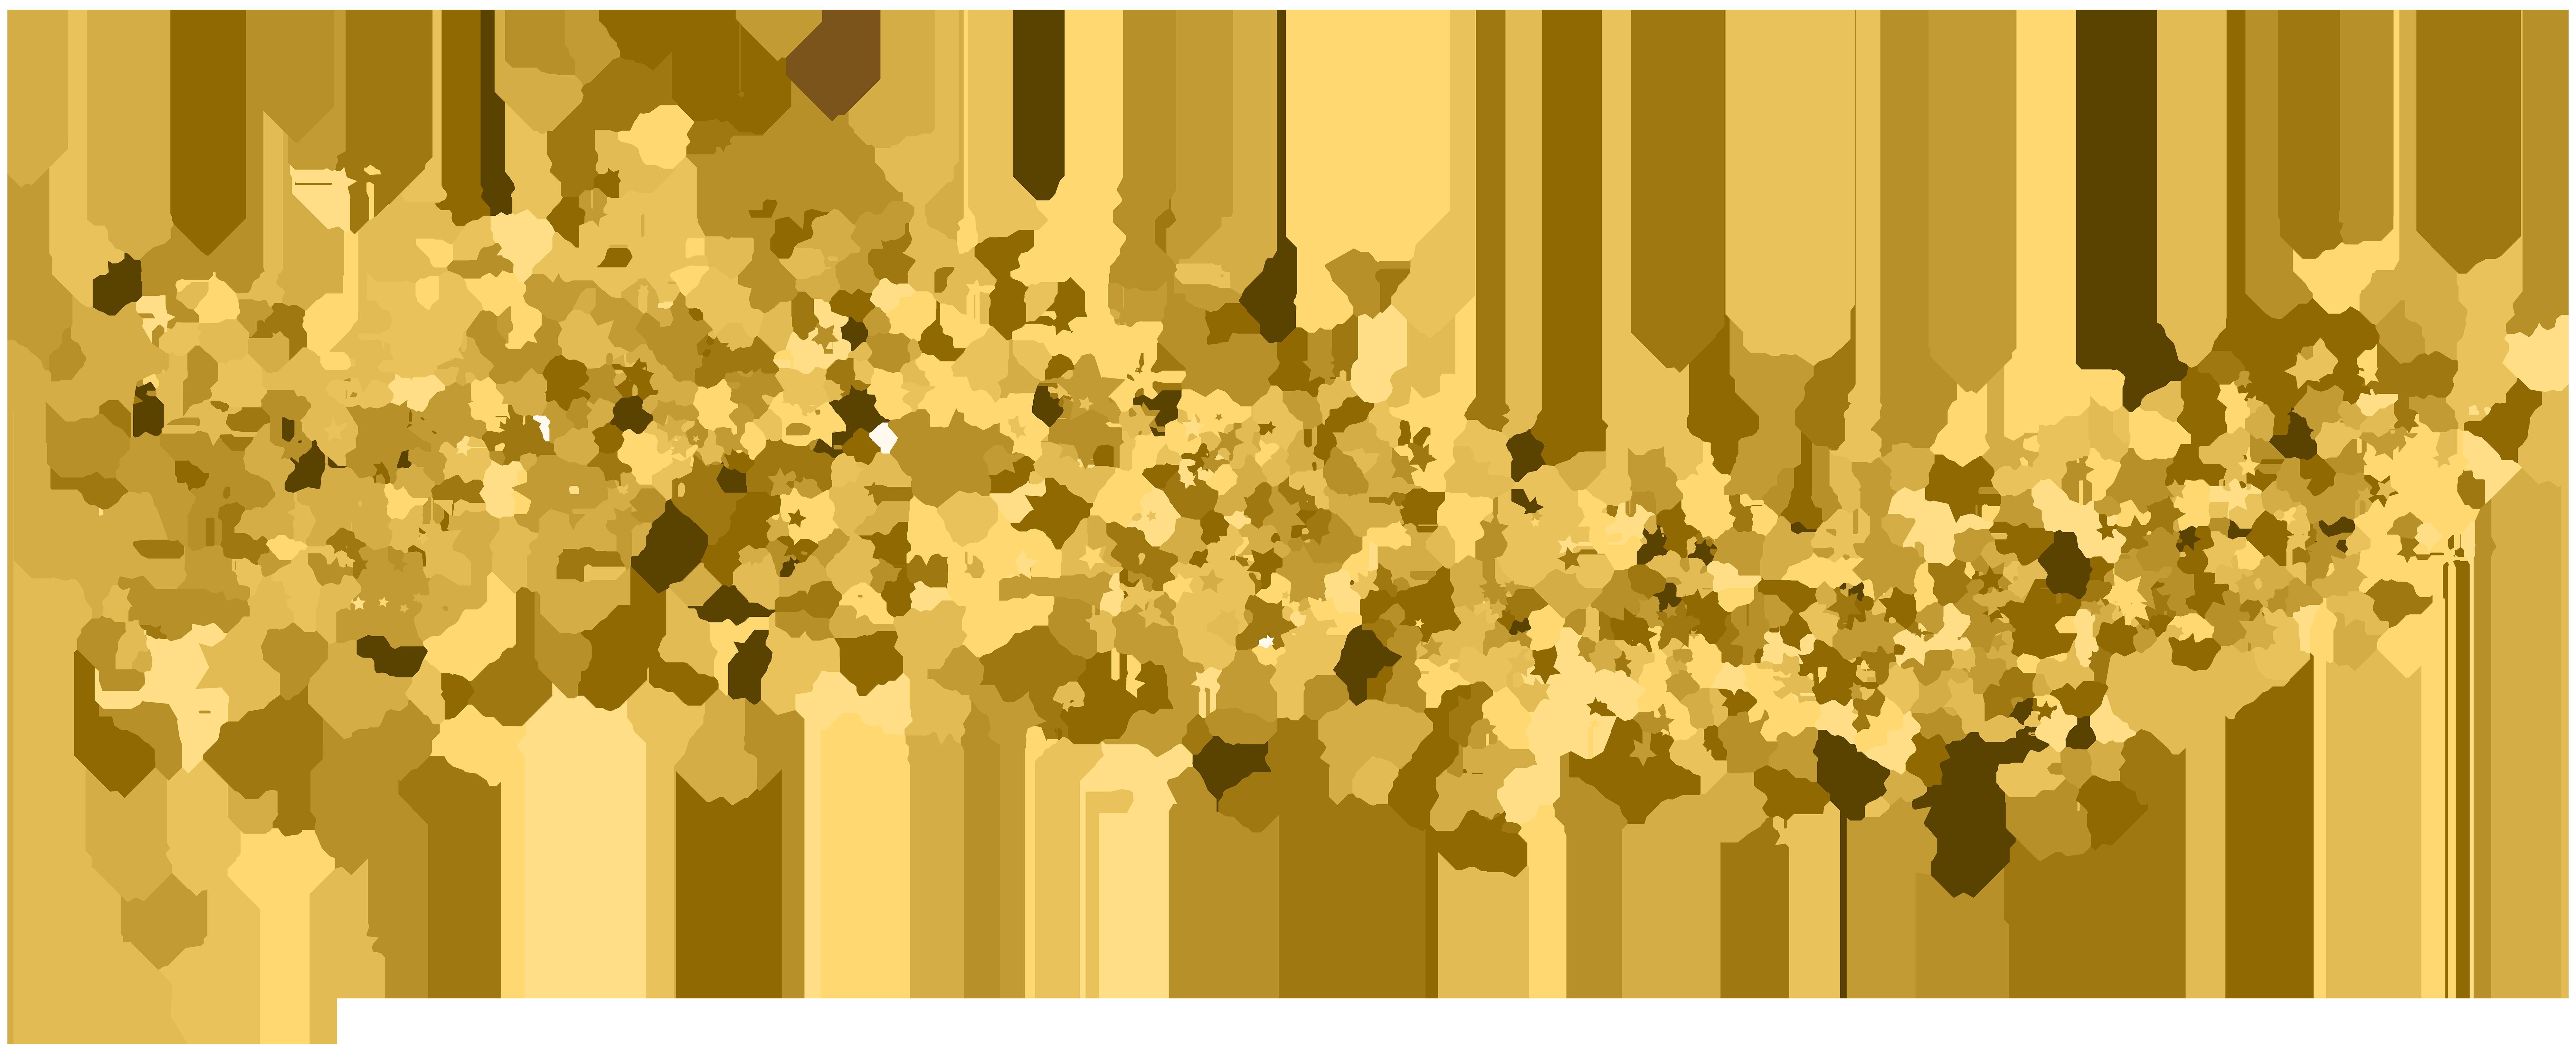 Transparent clipart star picture black and white download Deco Stars Transparent Clip Art Image | Gallery Yopriceville - High ... picture black and white download